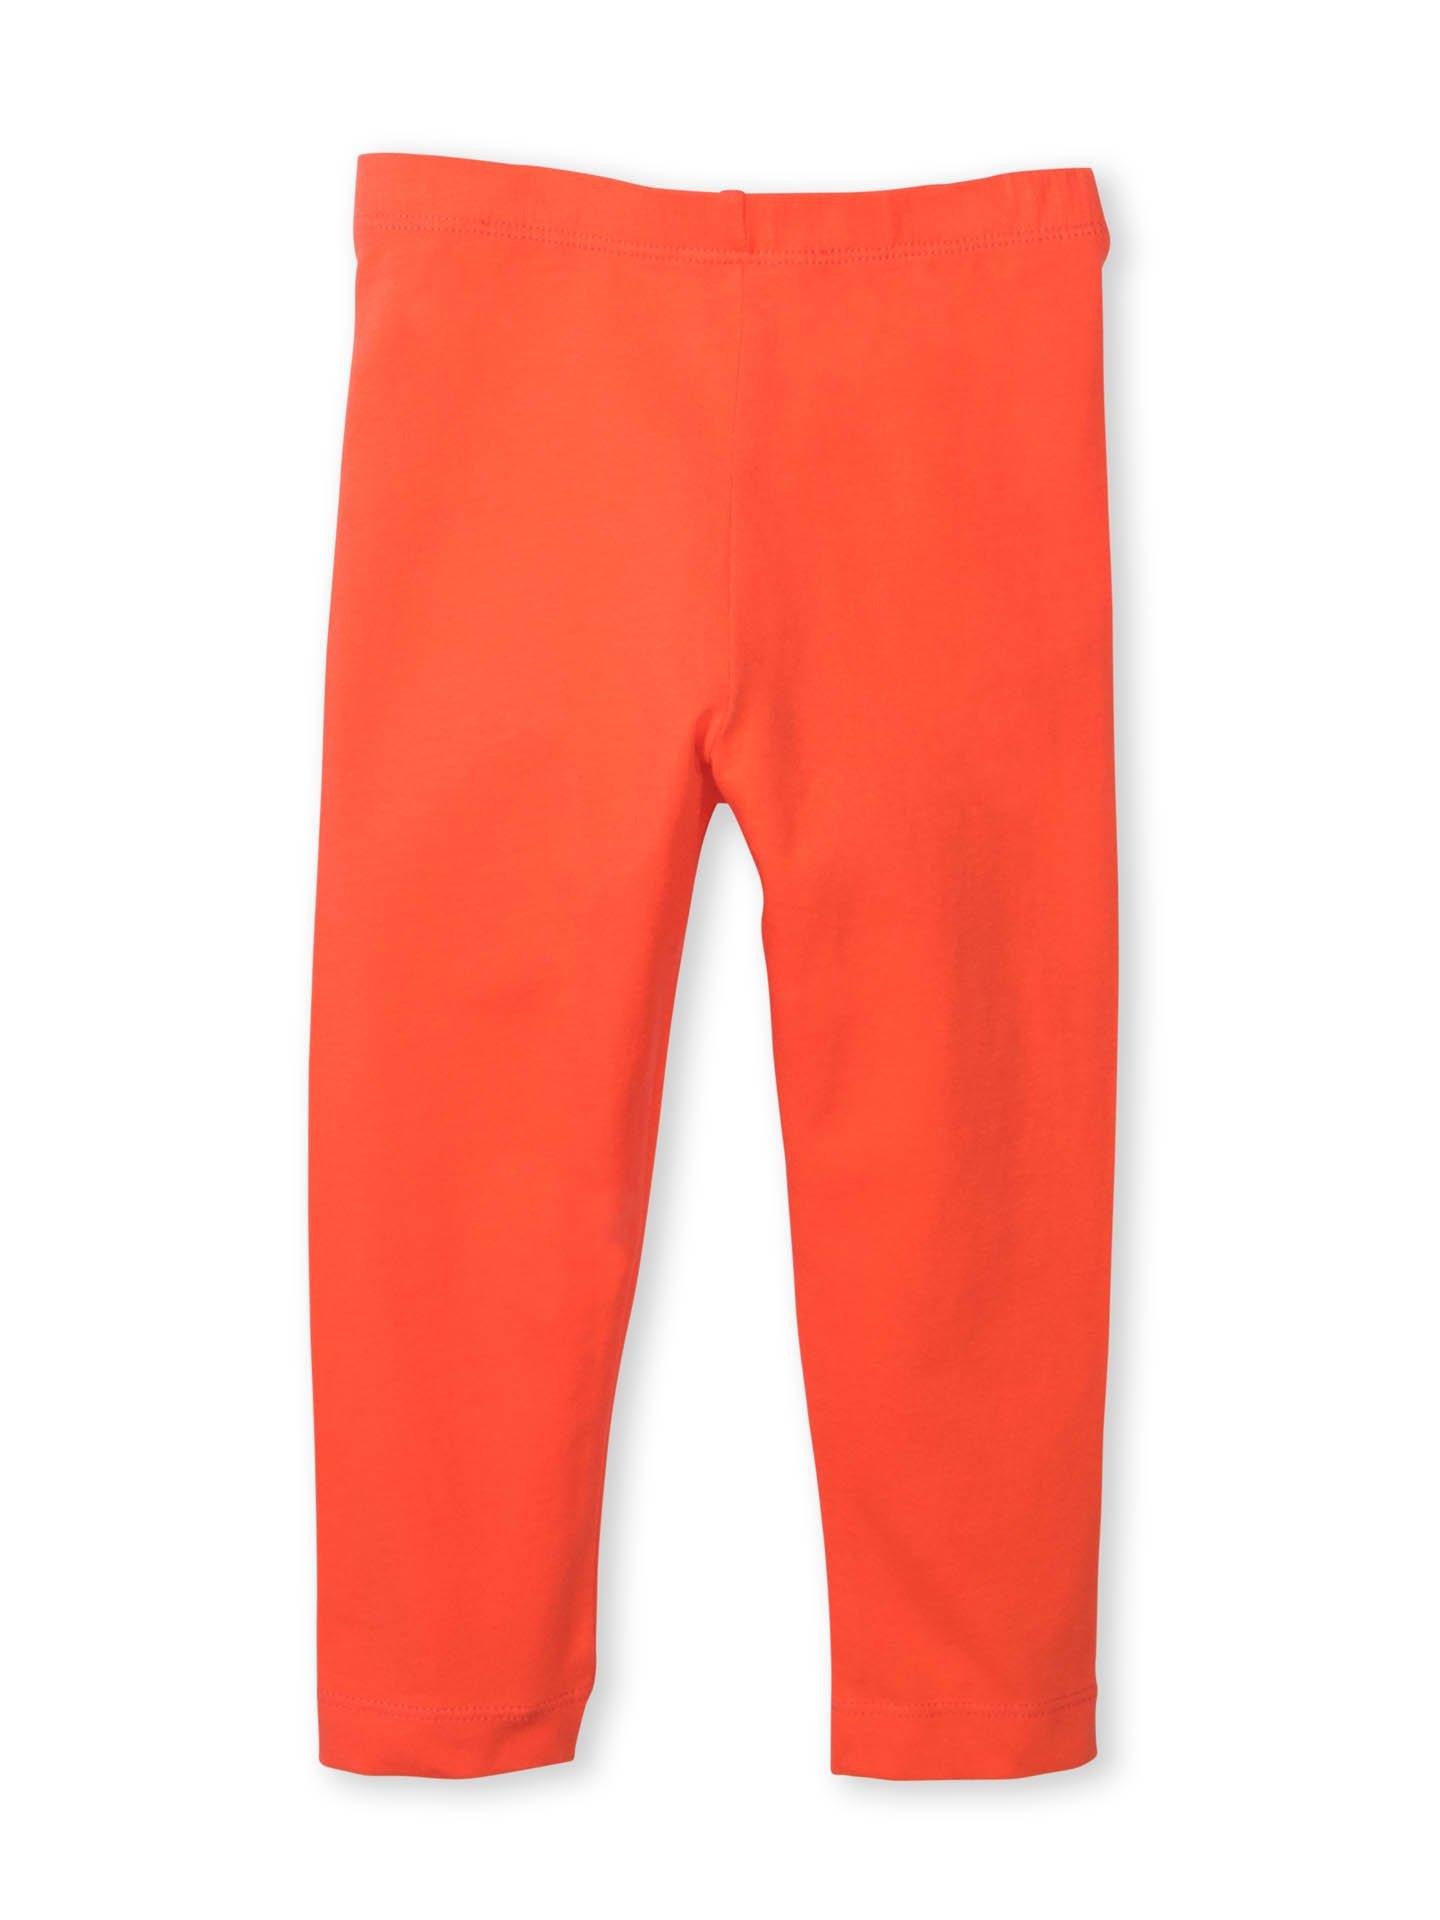 Colored Organics Girls Organic Cotton Cropped Legging Capris - Hot Coral - 4T